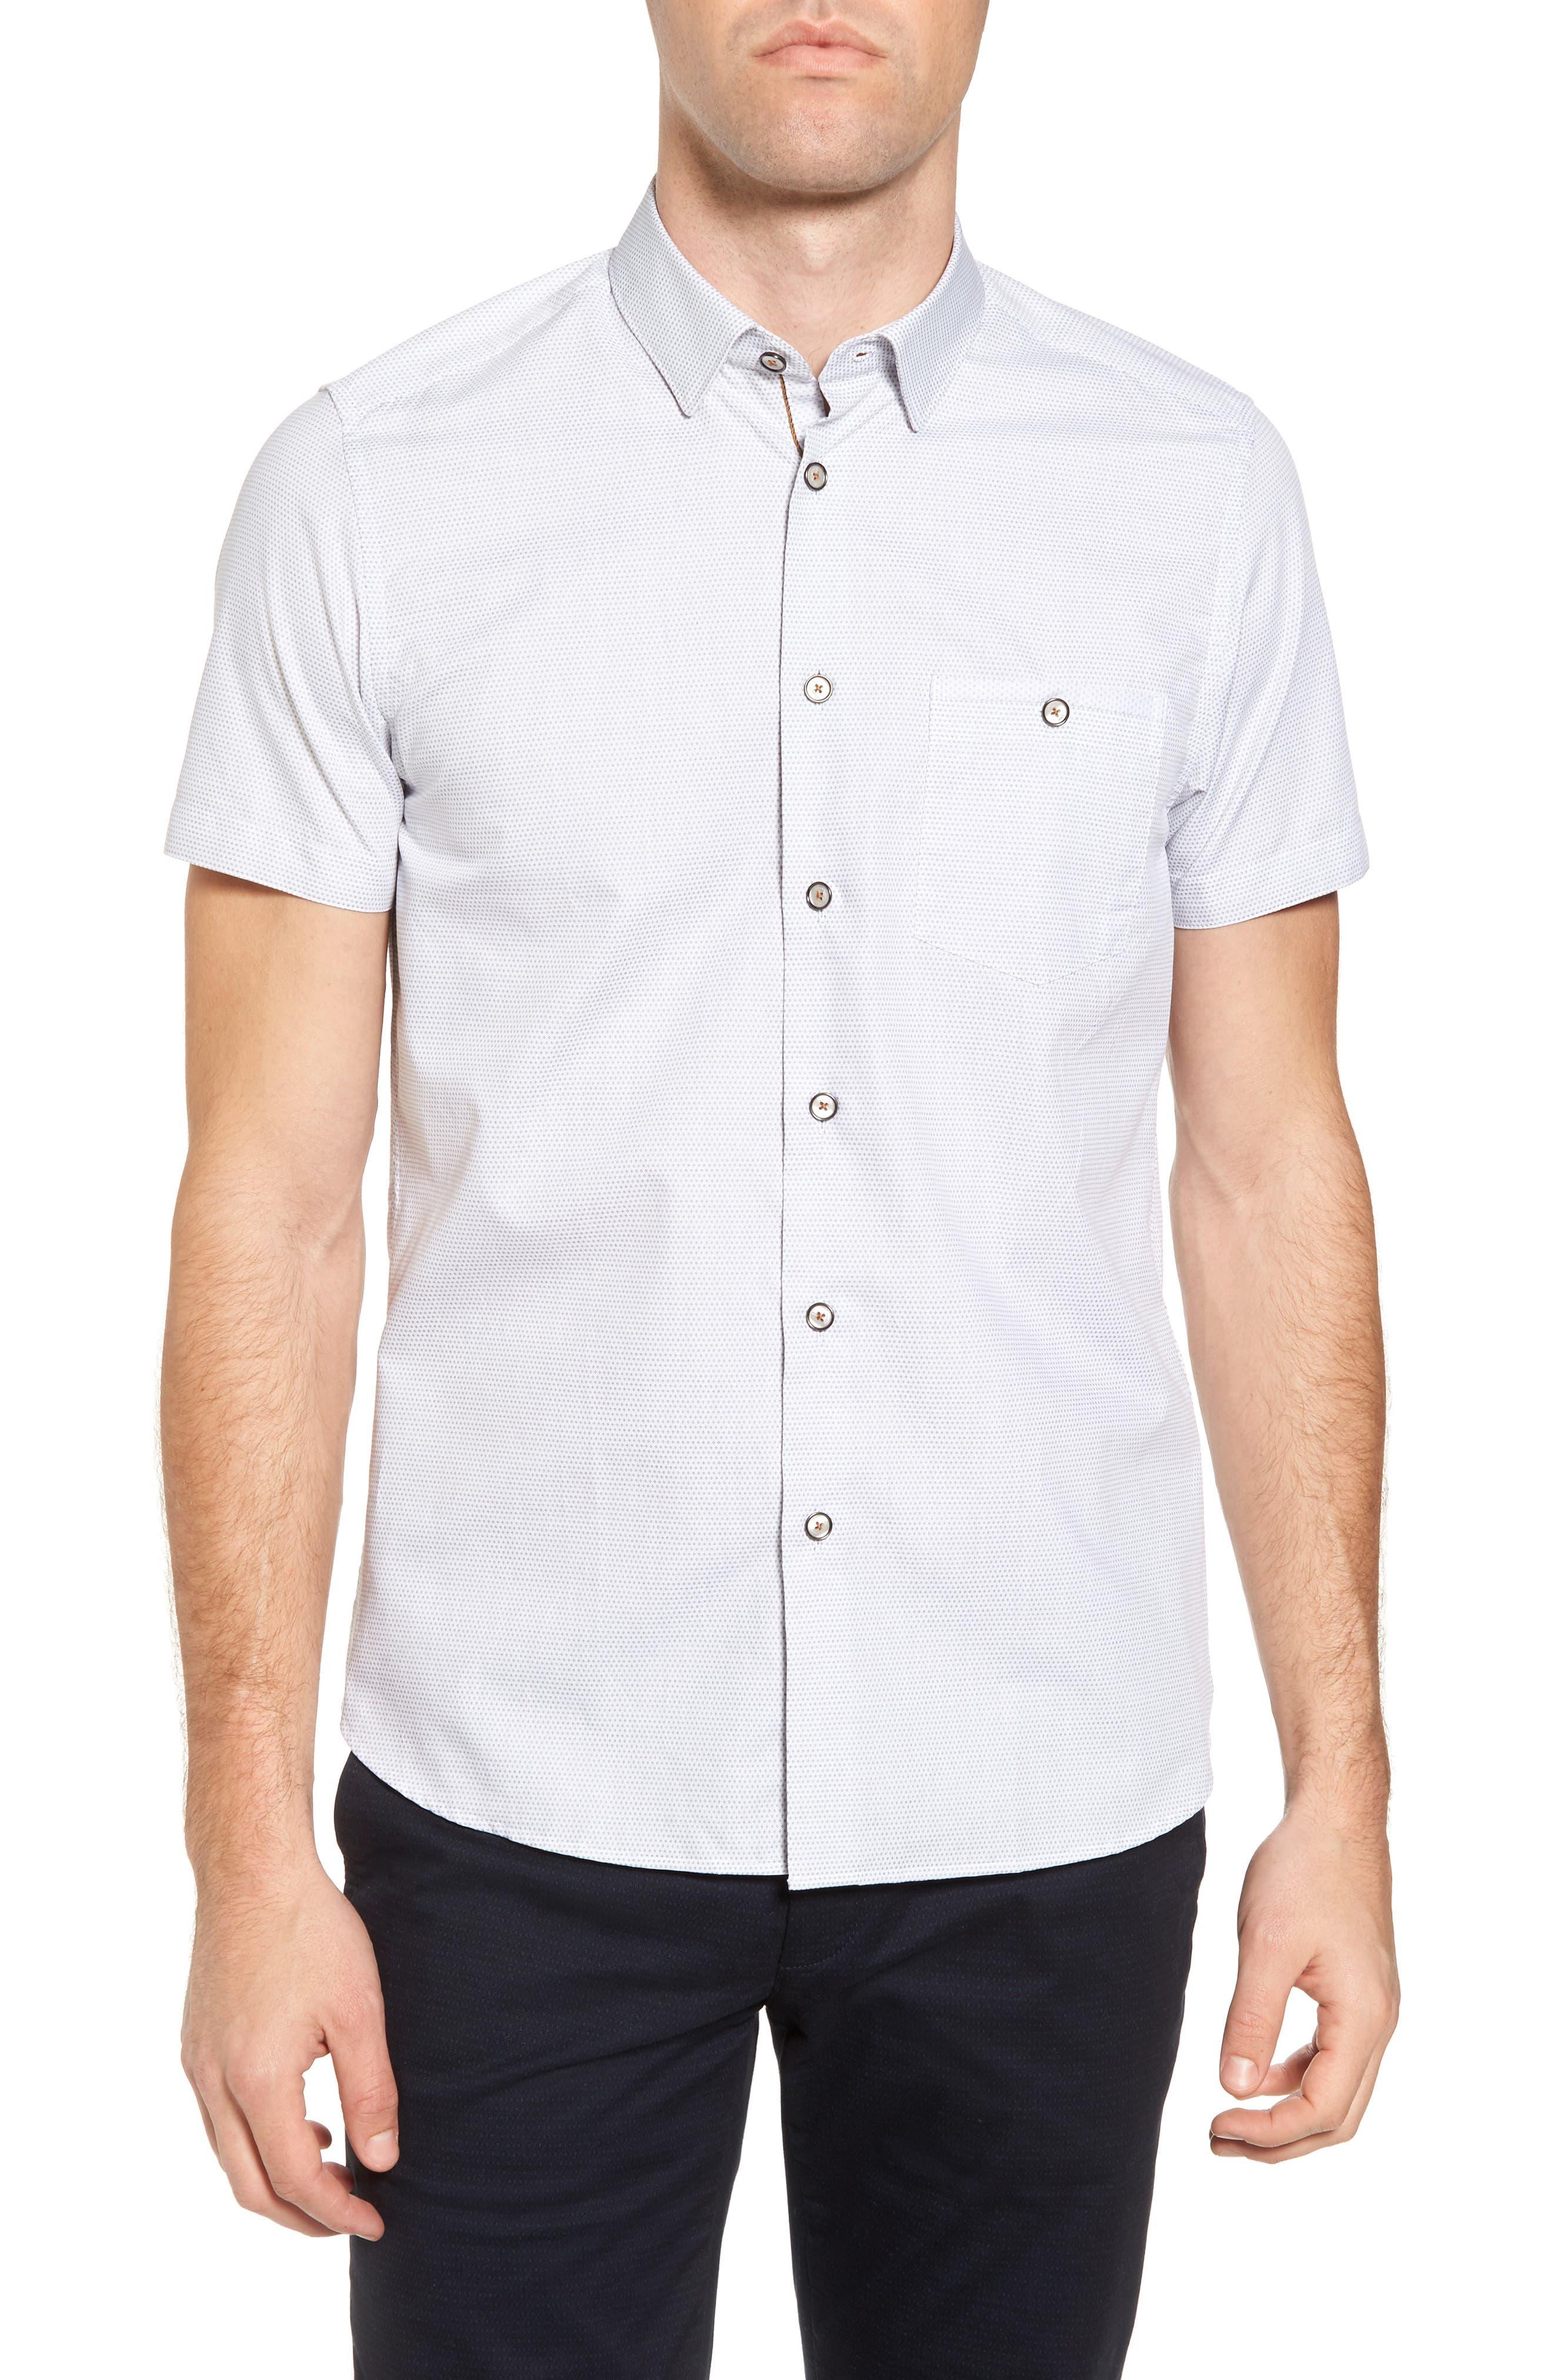 35f87afbed27bd Ted Baker Dotdots Trim Fit Dot Short Sleeve Sport Shirt In White ...